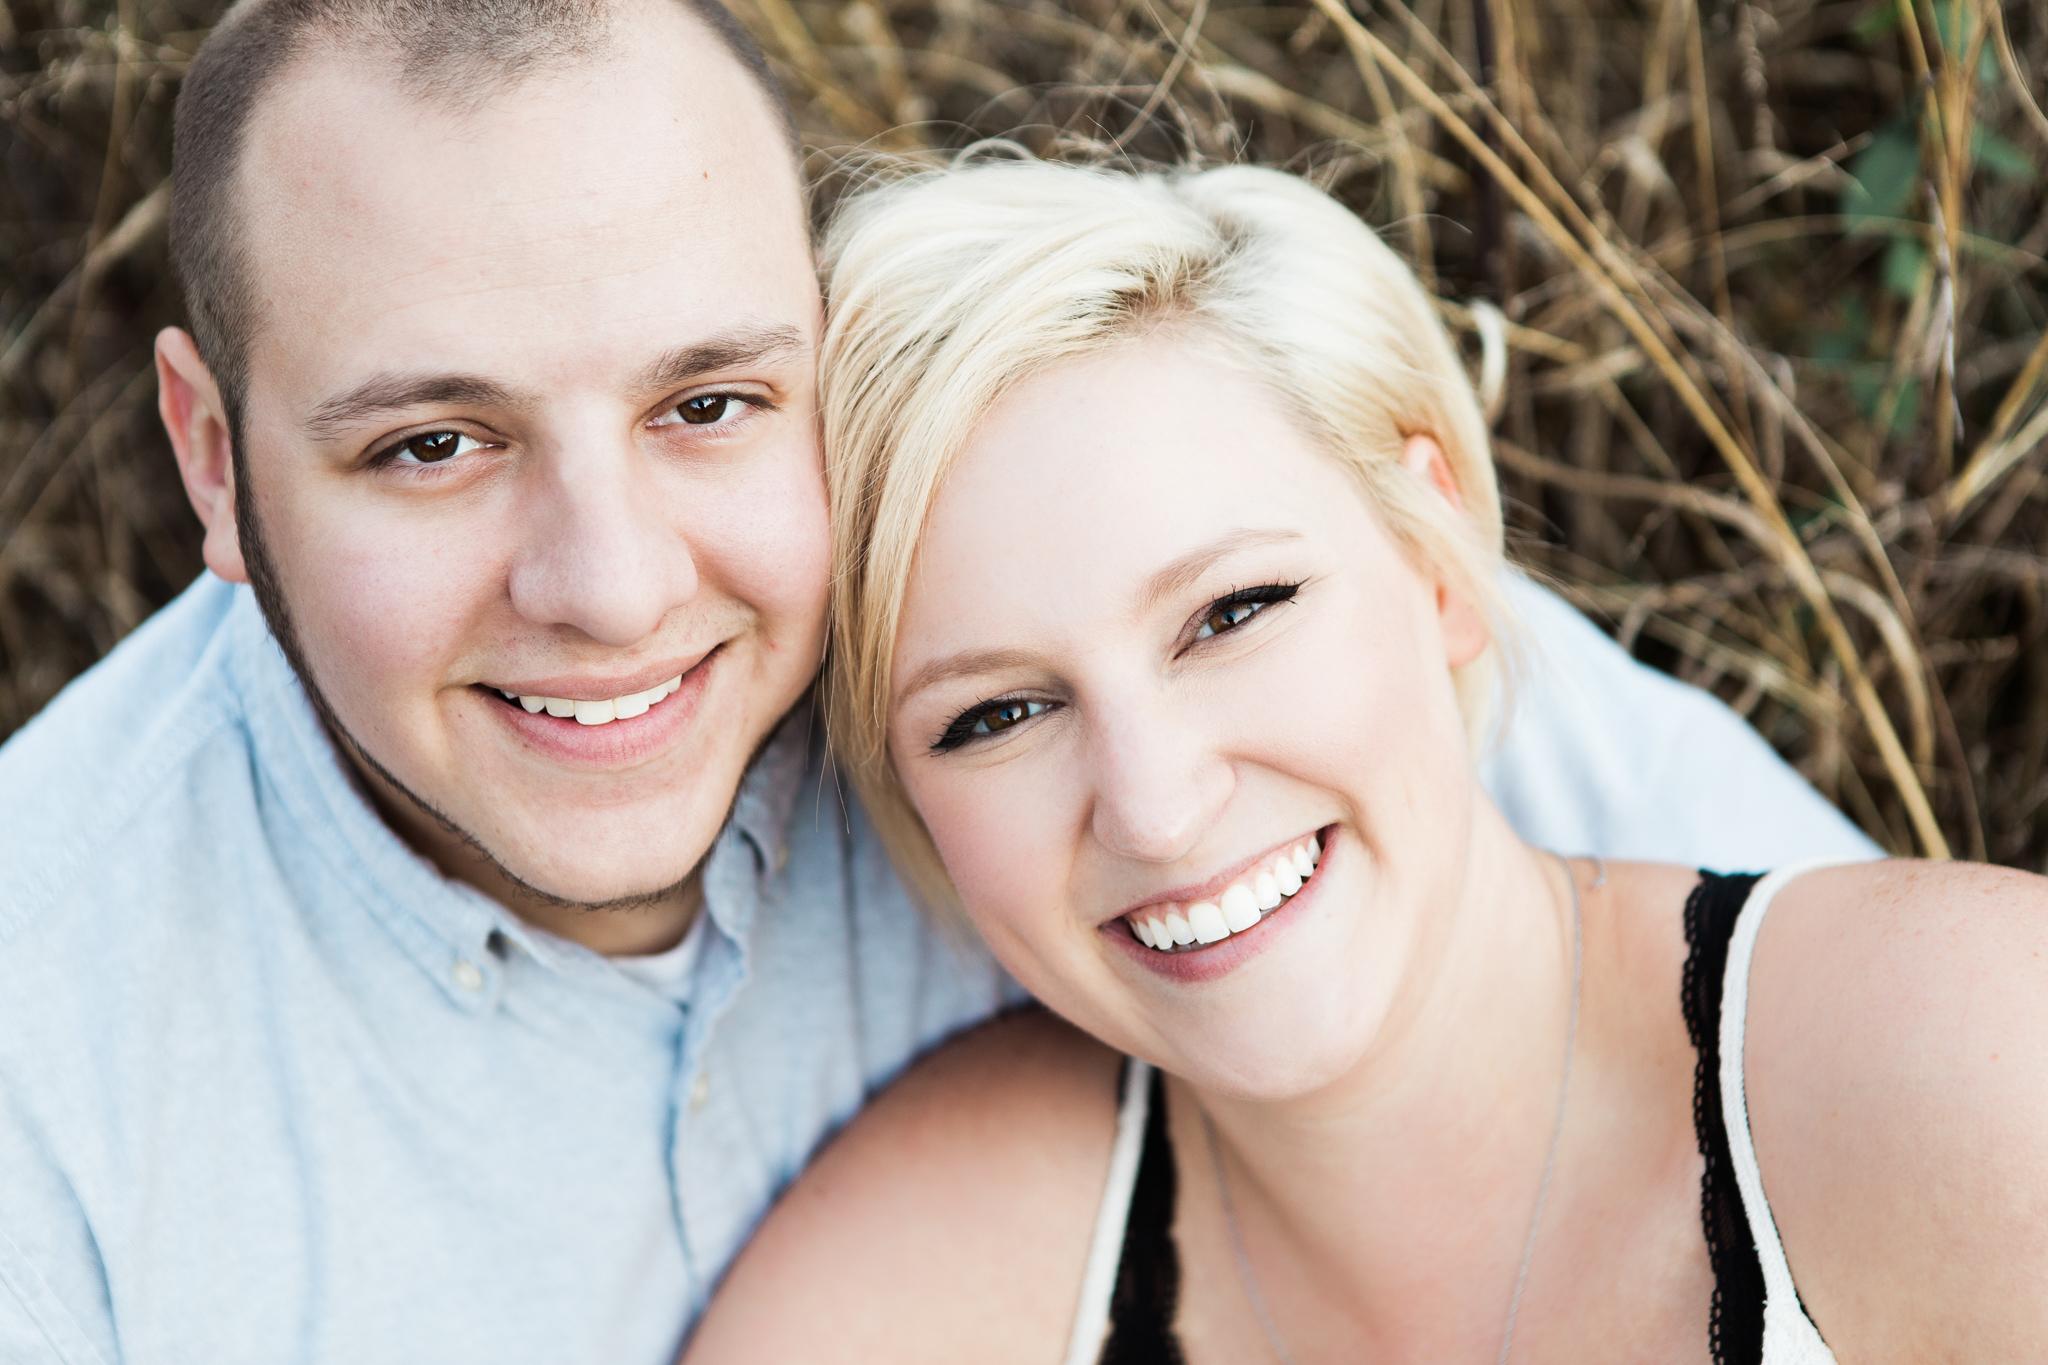 Richmond Kentucky Engagement Photographer - Ariana Jordan Photography -25.jpg